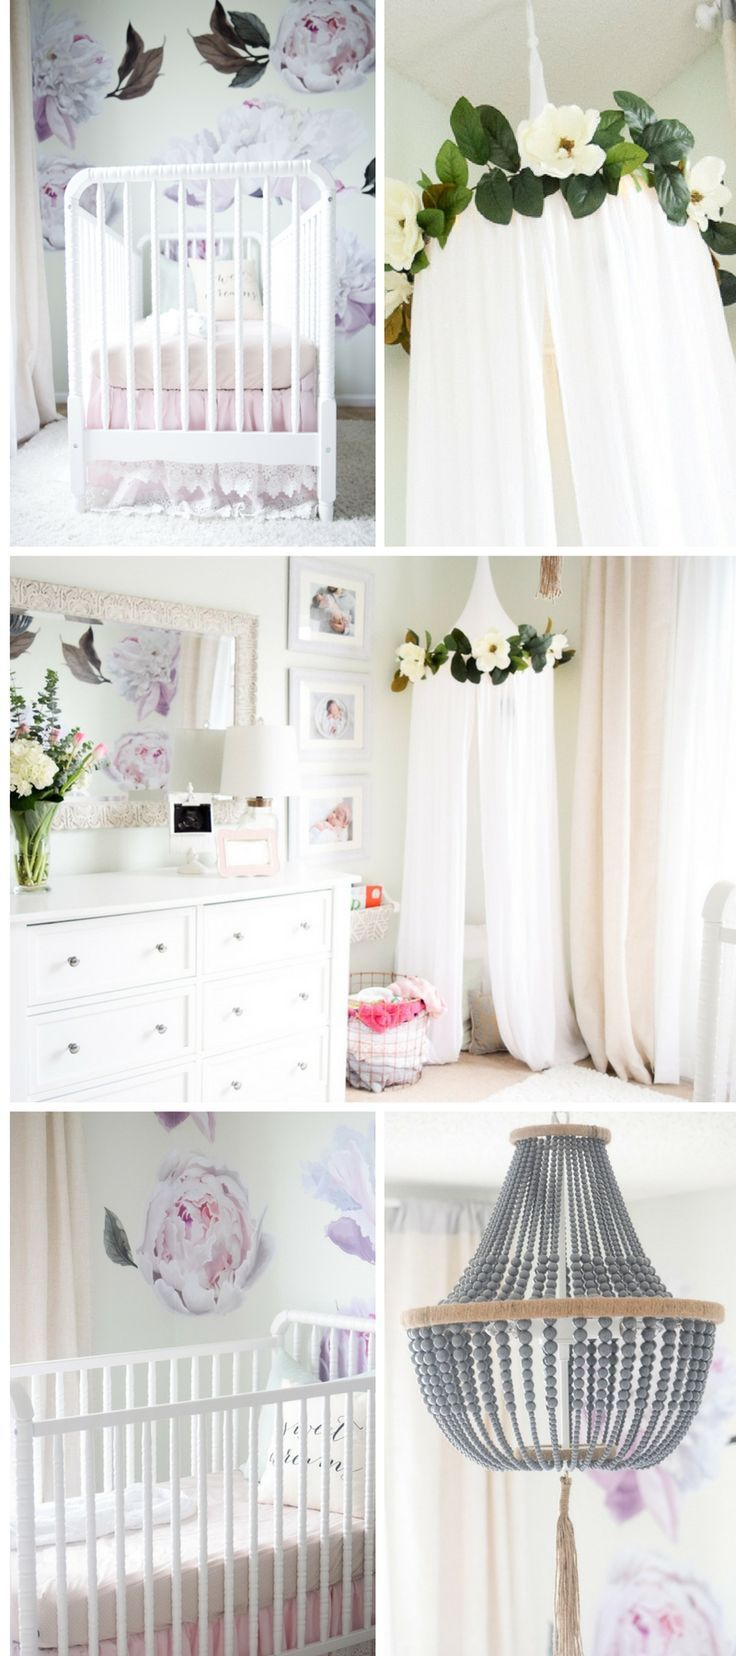 189 best Nursery Ideas images on Pinterest | Baby ideas, Baby room ...